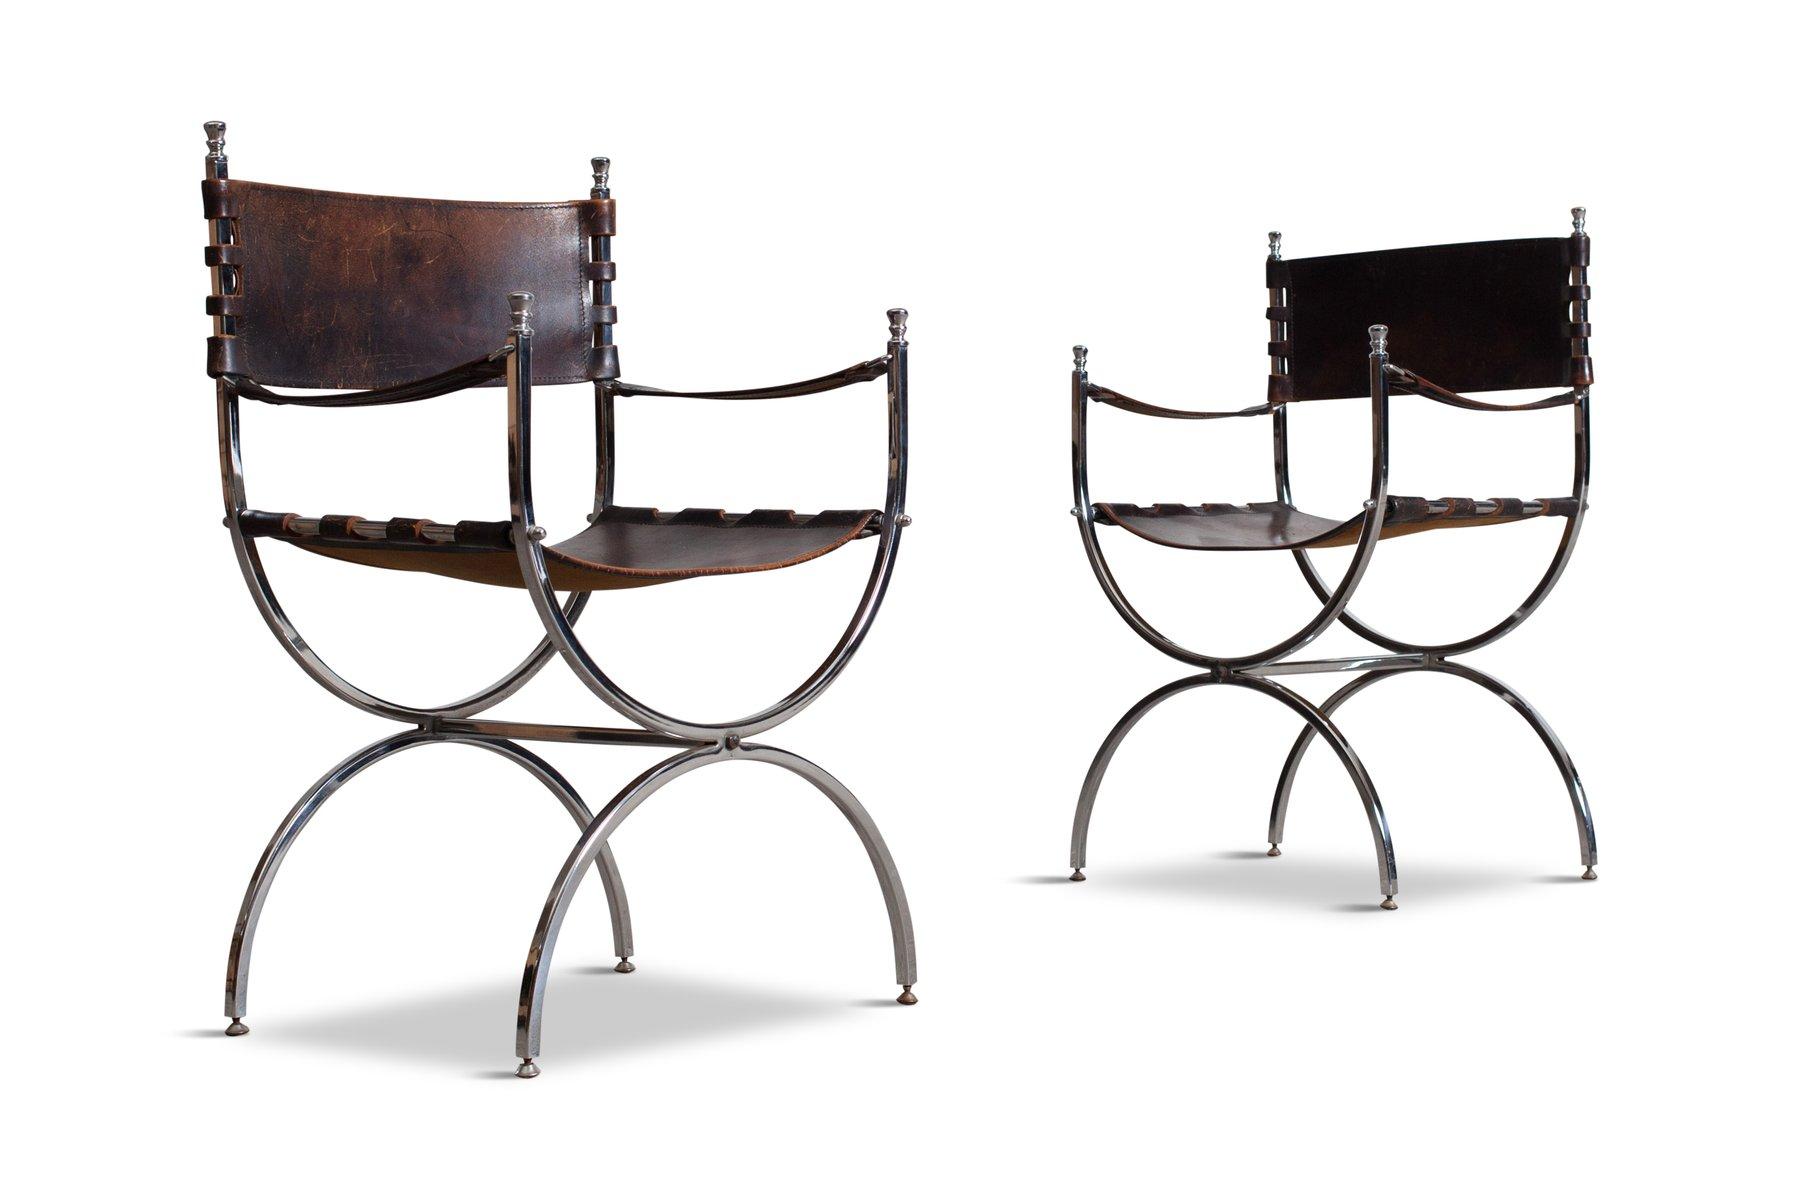 Savonarola emperor chairs by maison jansen 1970s set of 4 for sale at pamono - Savonarola sedia ...